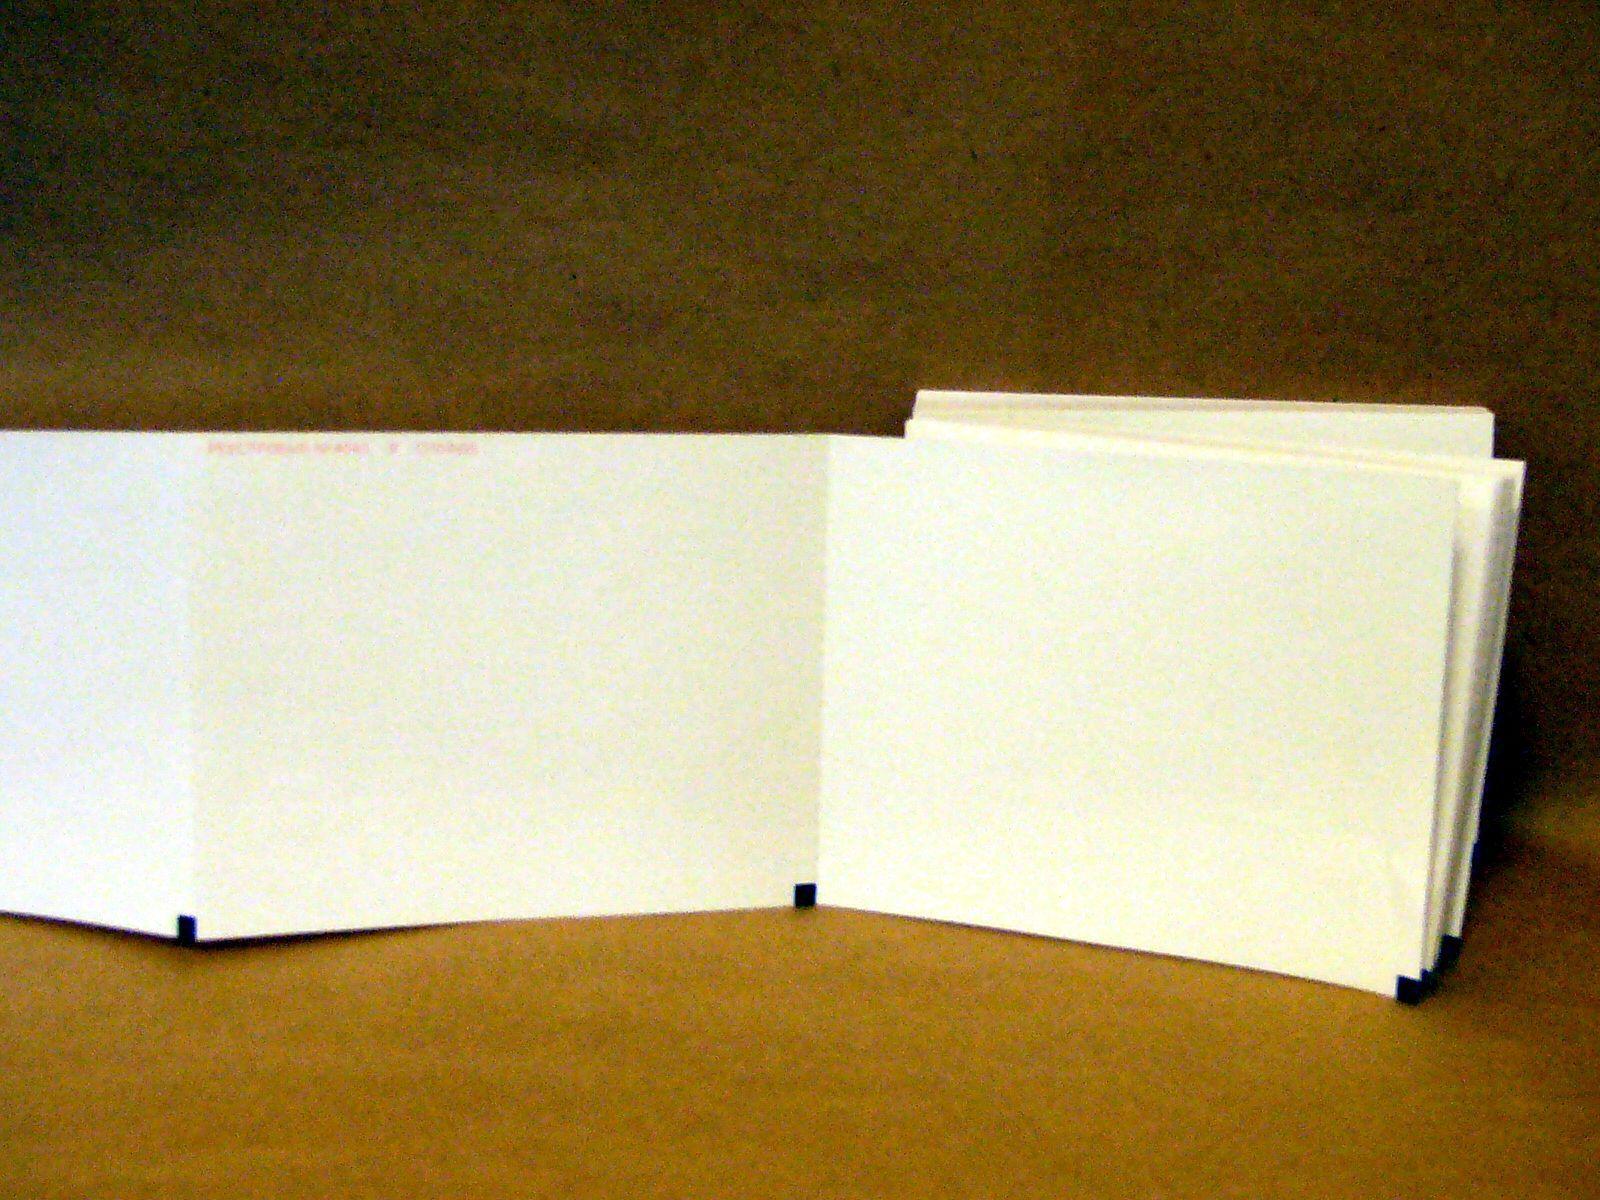 210х140х215, бумага ЭКГ для Nihon Kohden, реестр 4089/1